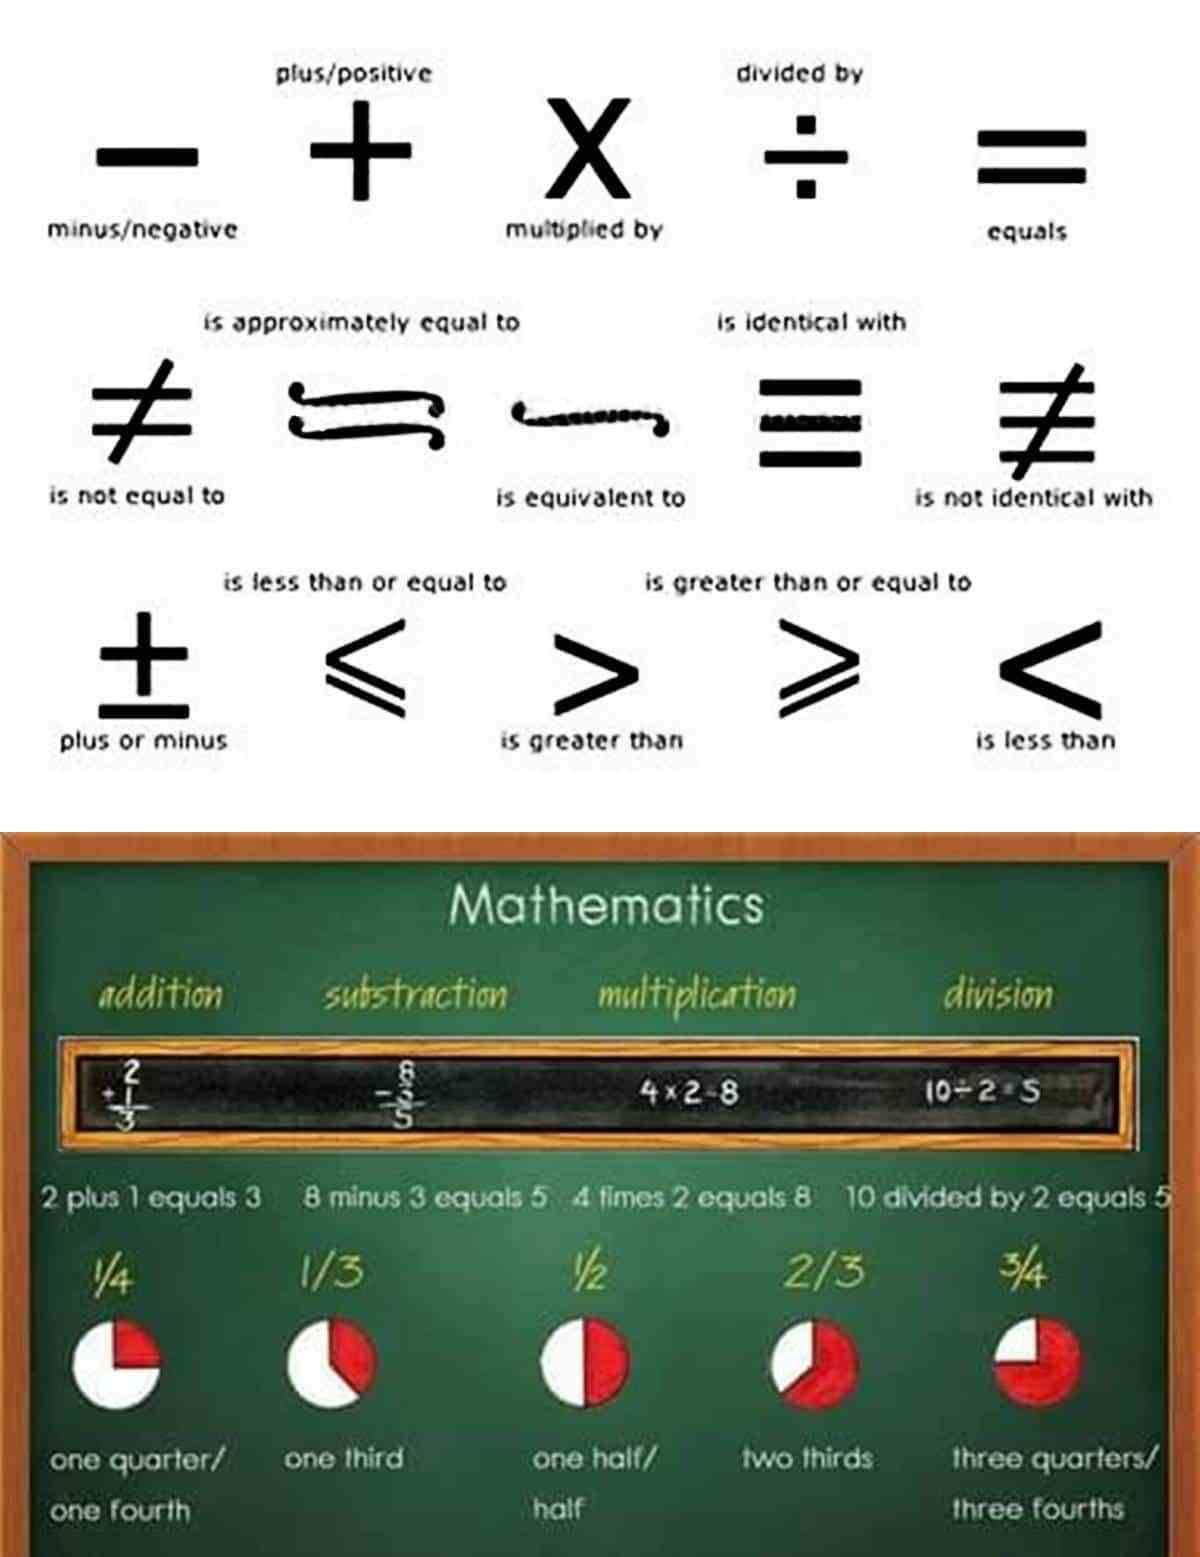 Punctuation Marks Keyboard And Math Symbols In English Symbols